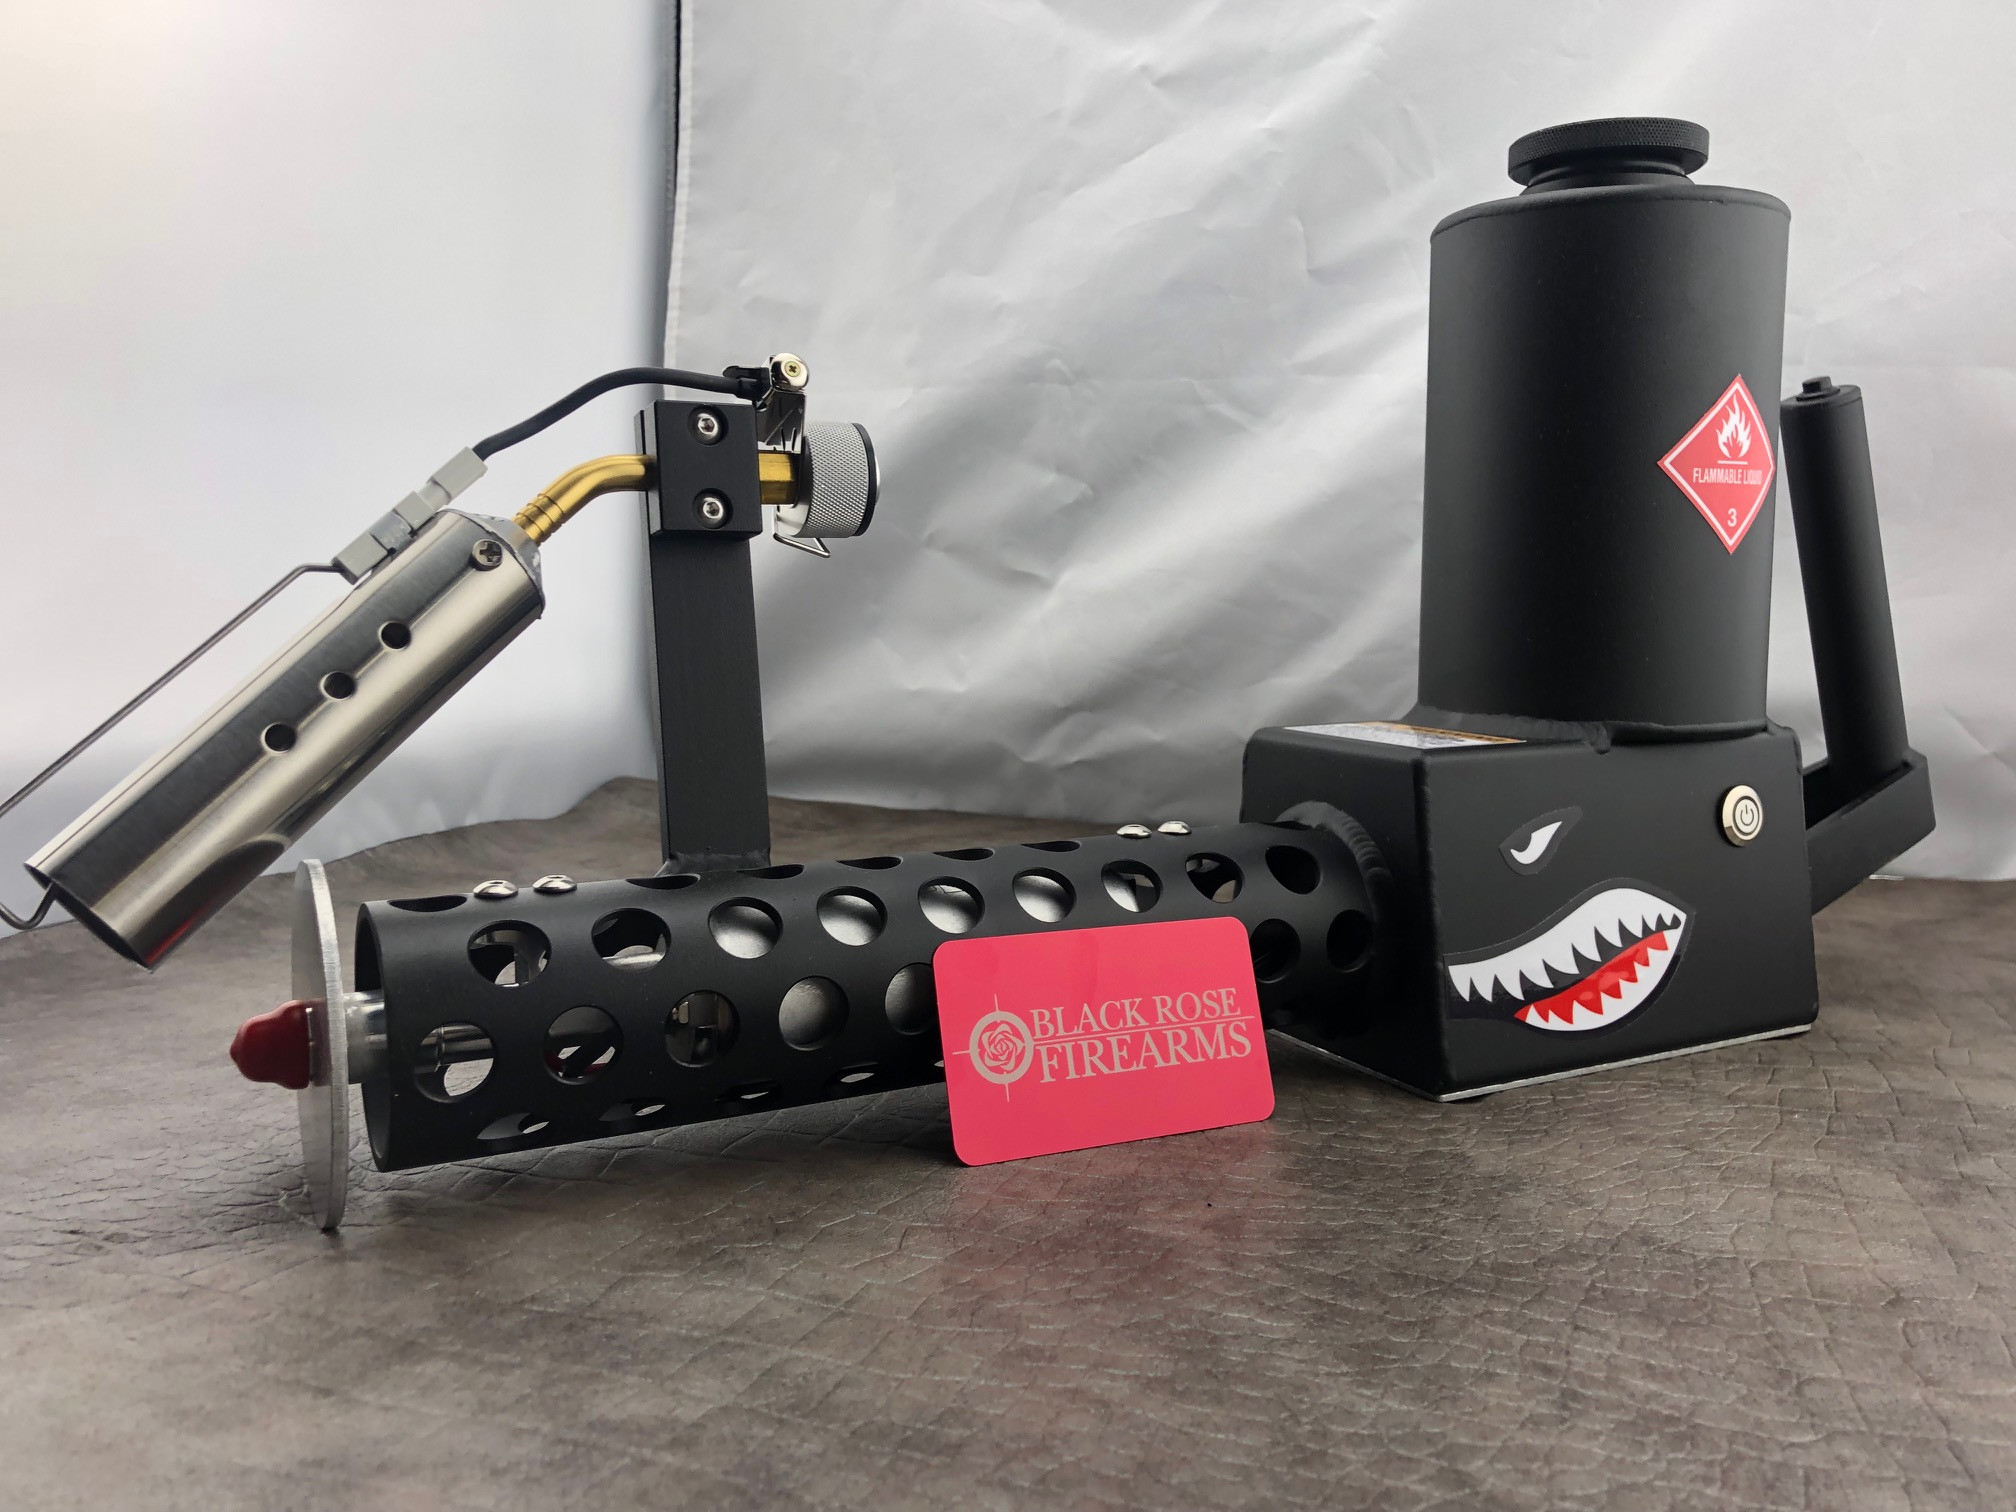 Xm42 Lite Flamethrower MINI